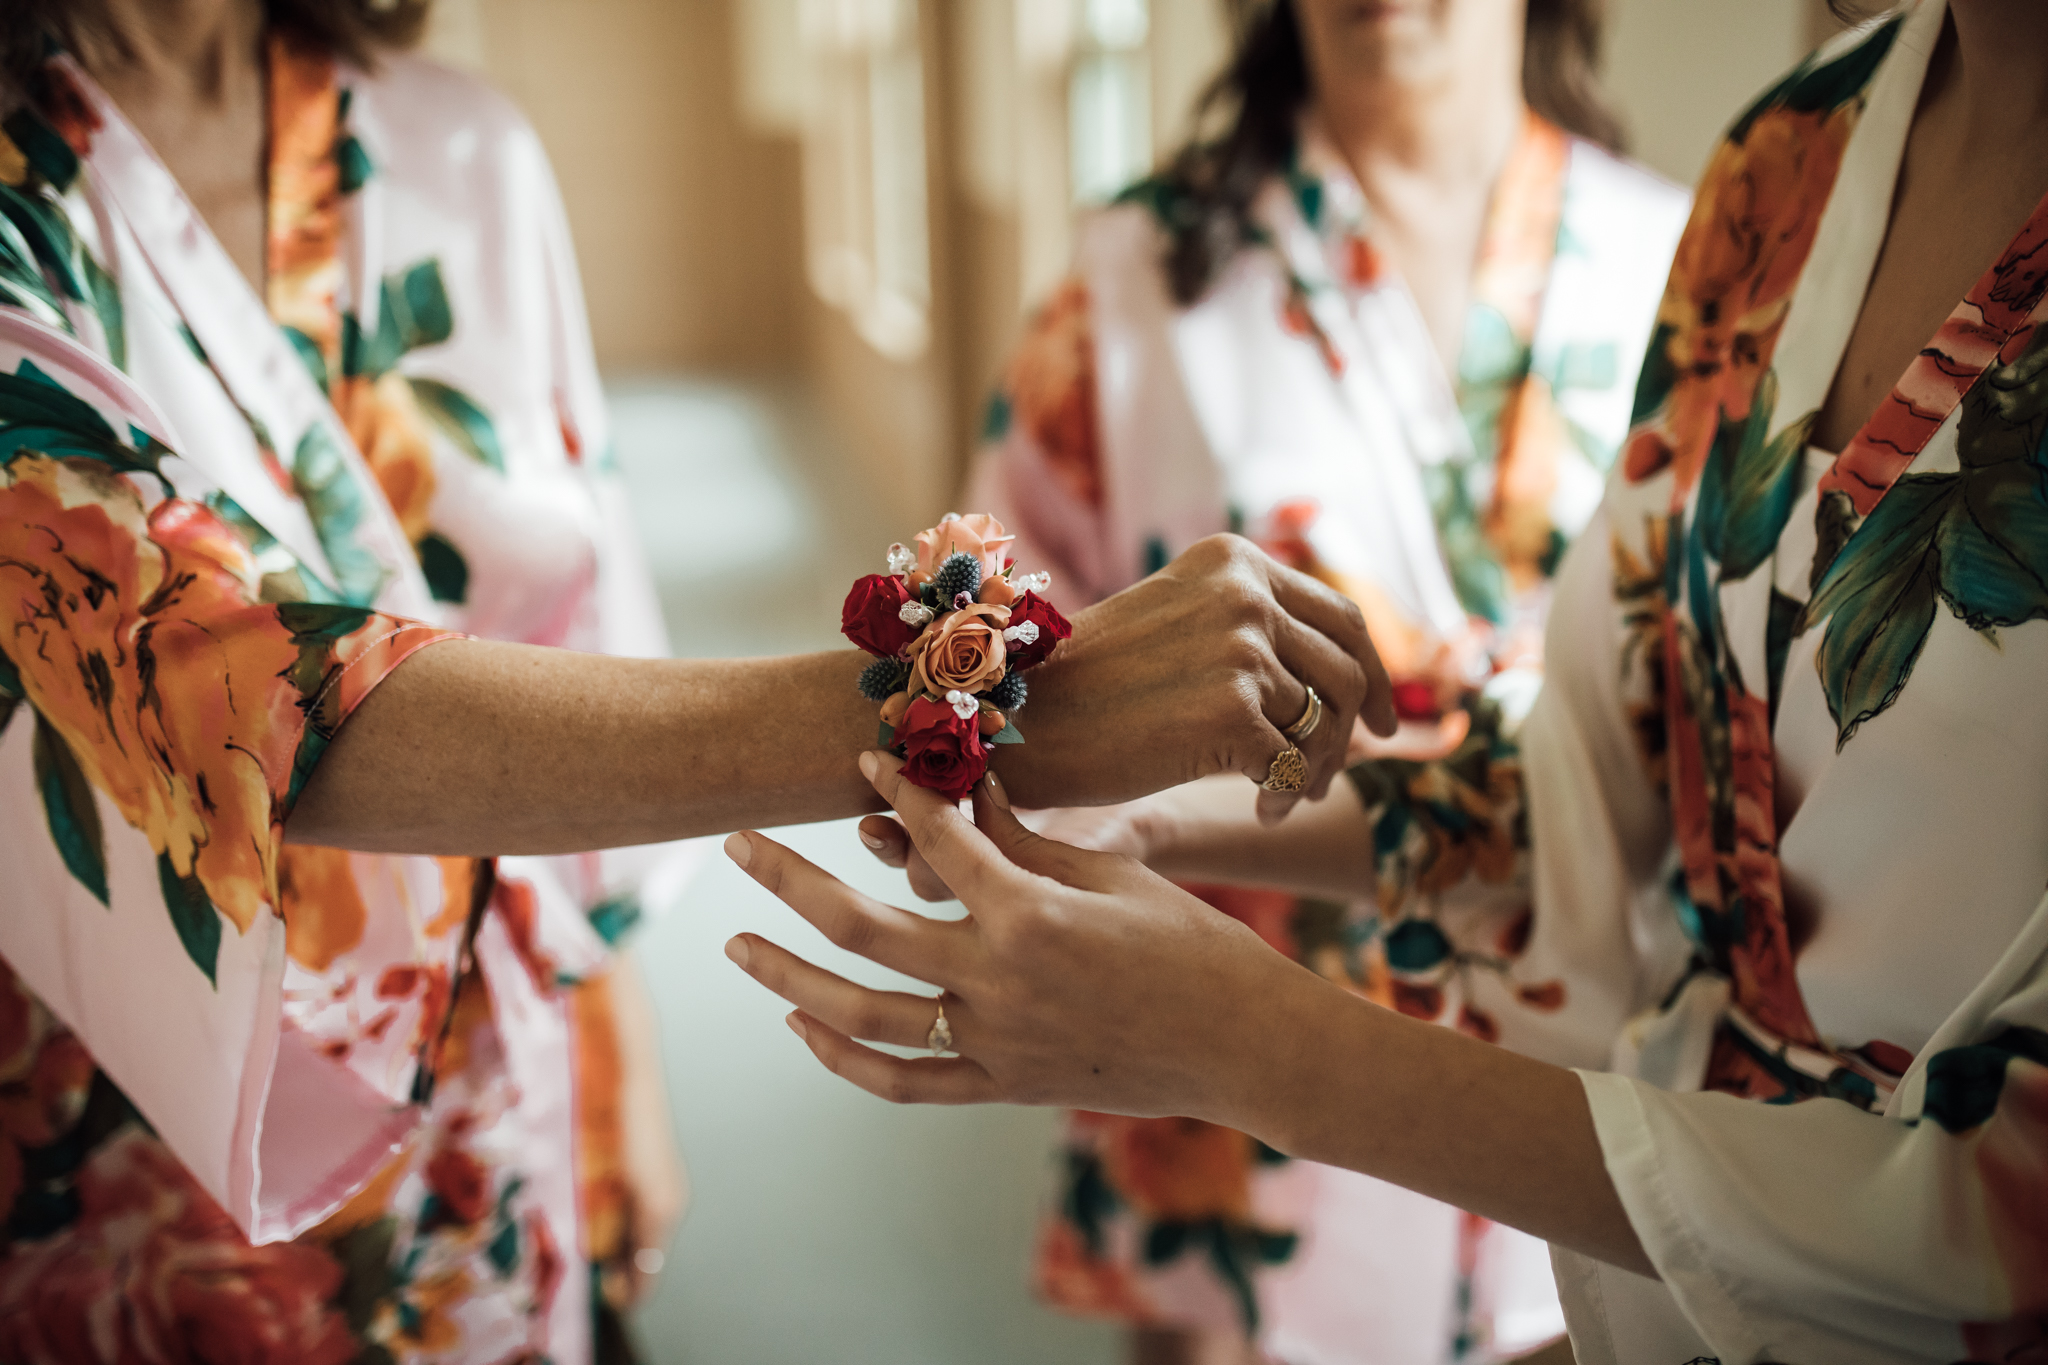 birmingham-alabama-wedding-photographer-laura-terry-the-warmth-around-you (16 of 110).jpg